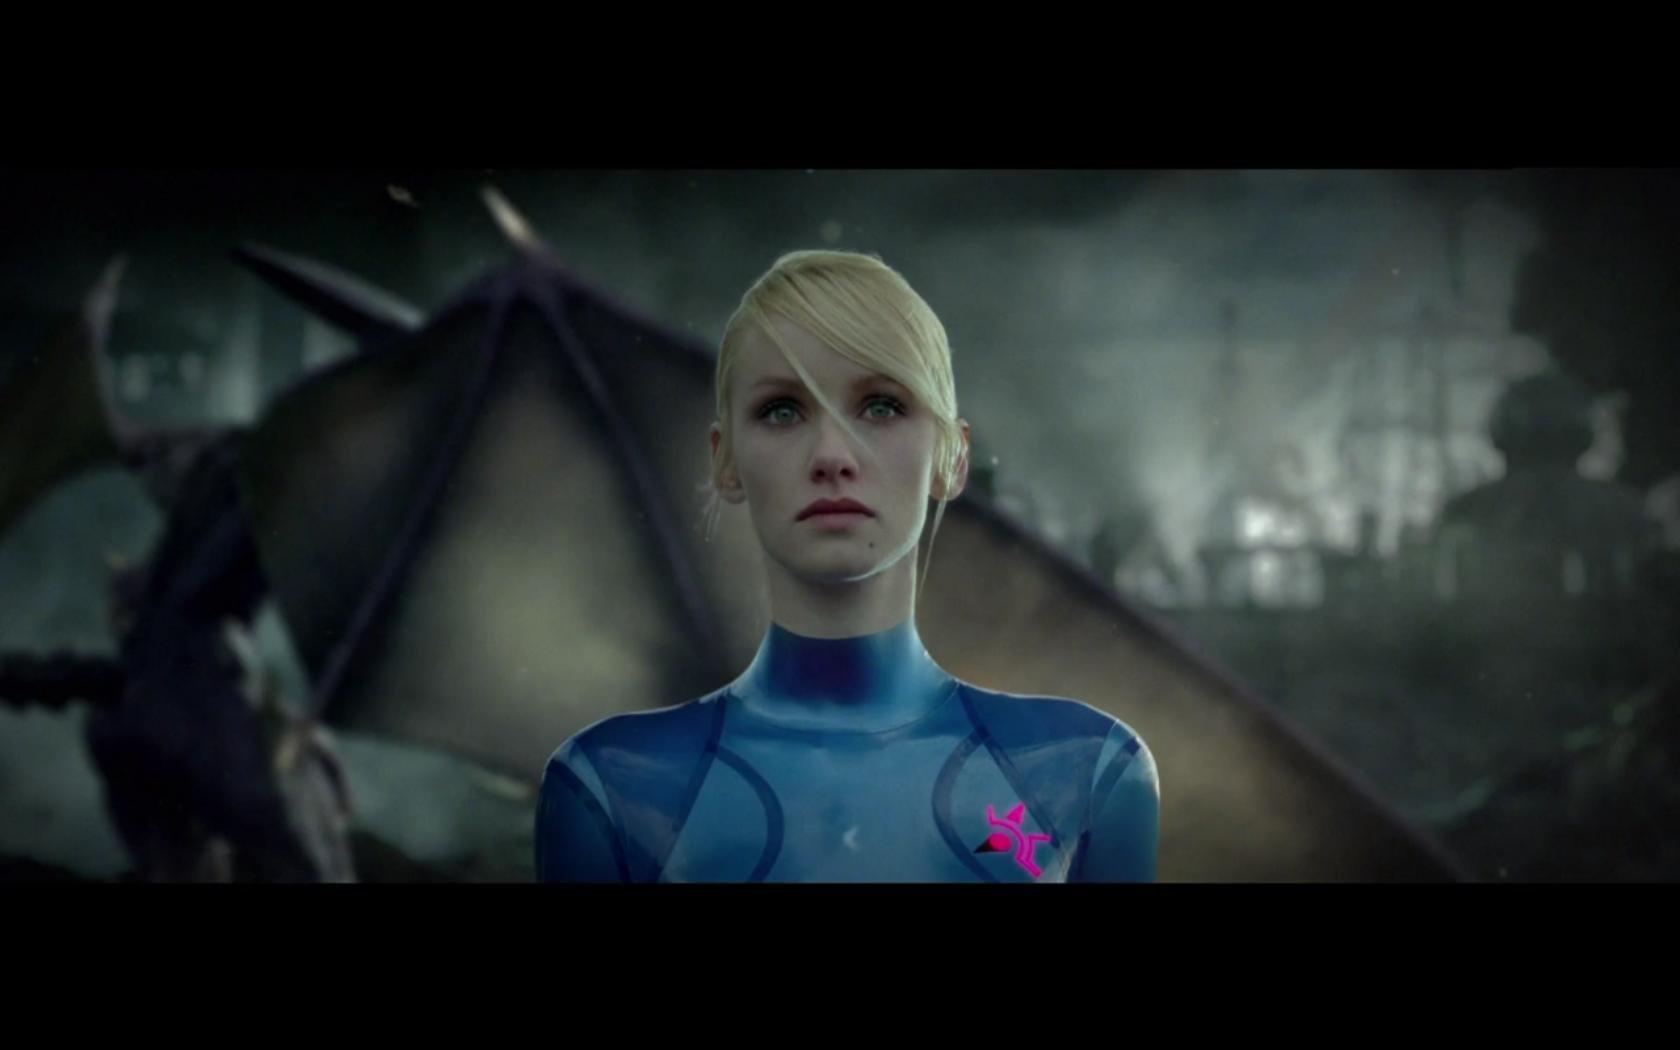 Blondes Metroid Women Cosplay Zero Suit Samus Aran Wallpaper